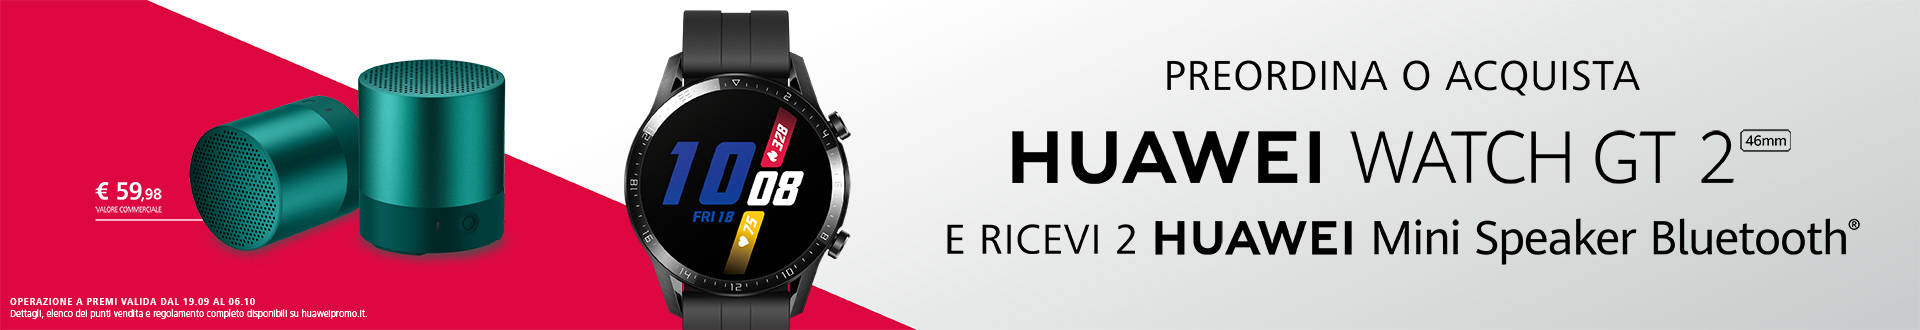 Promozione Huawei